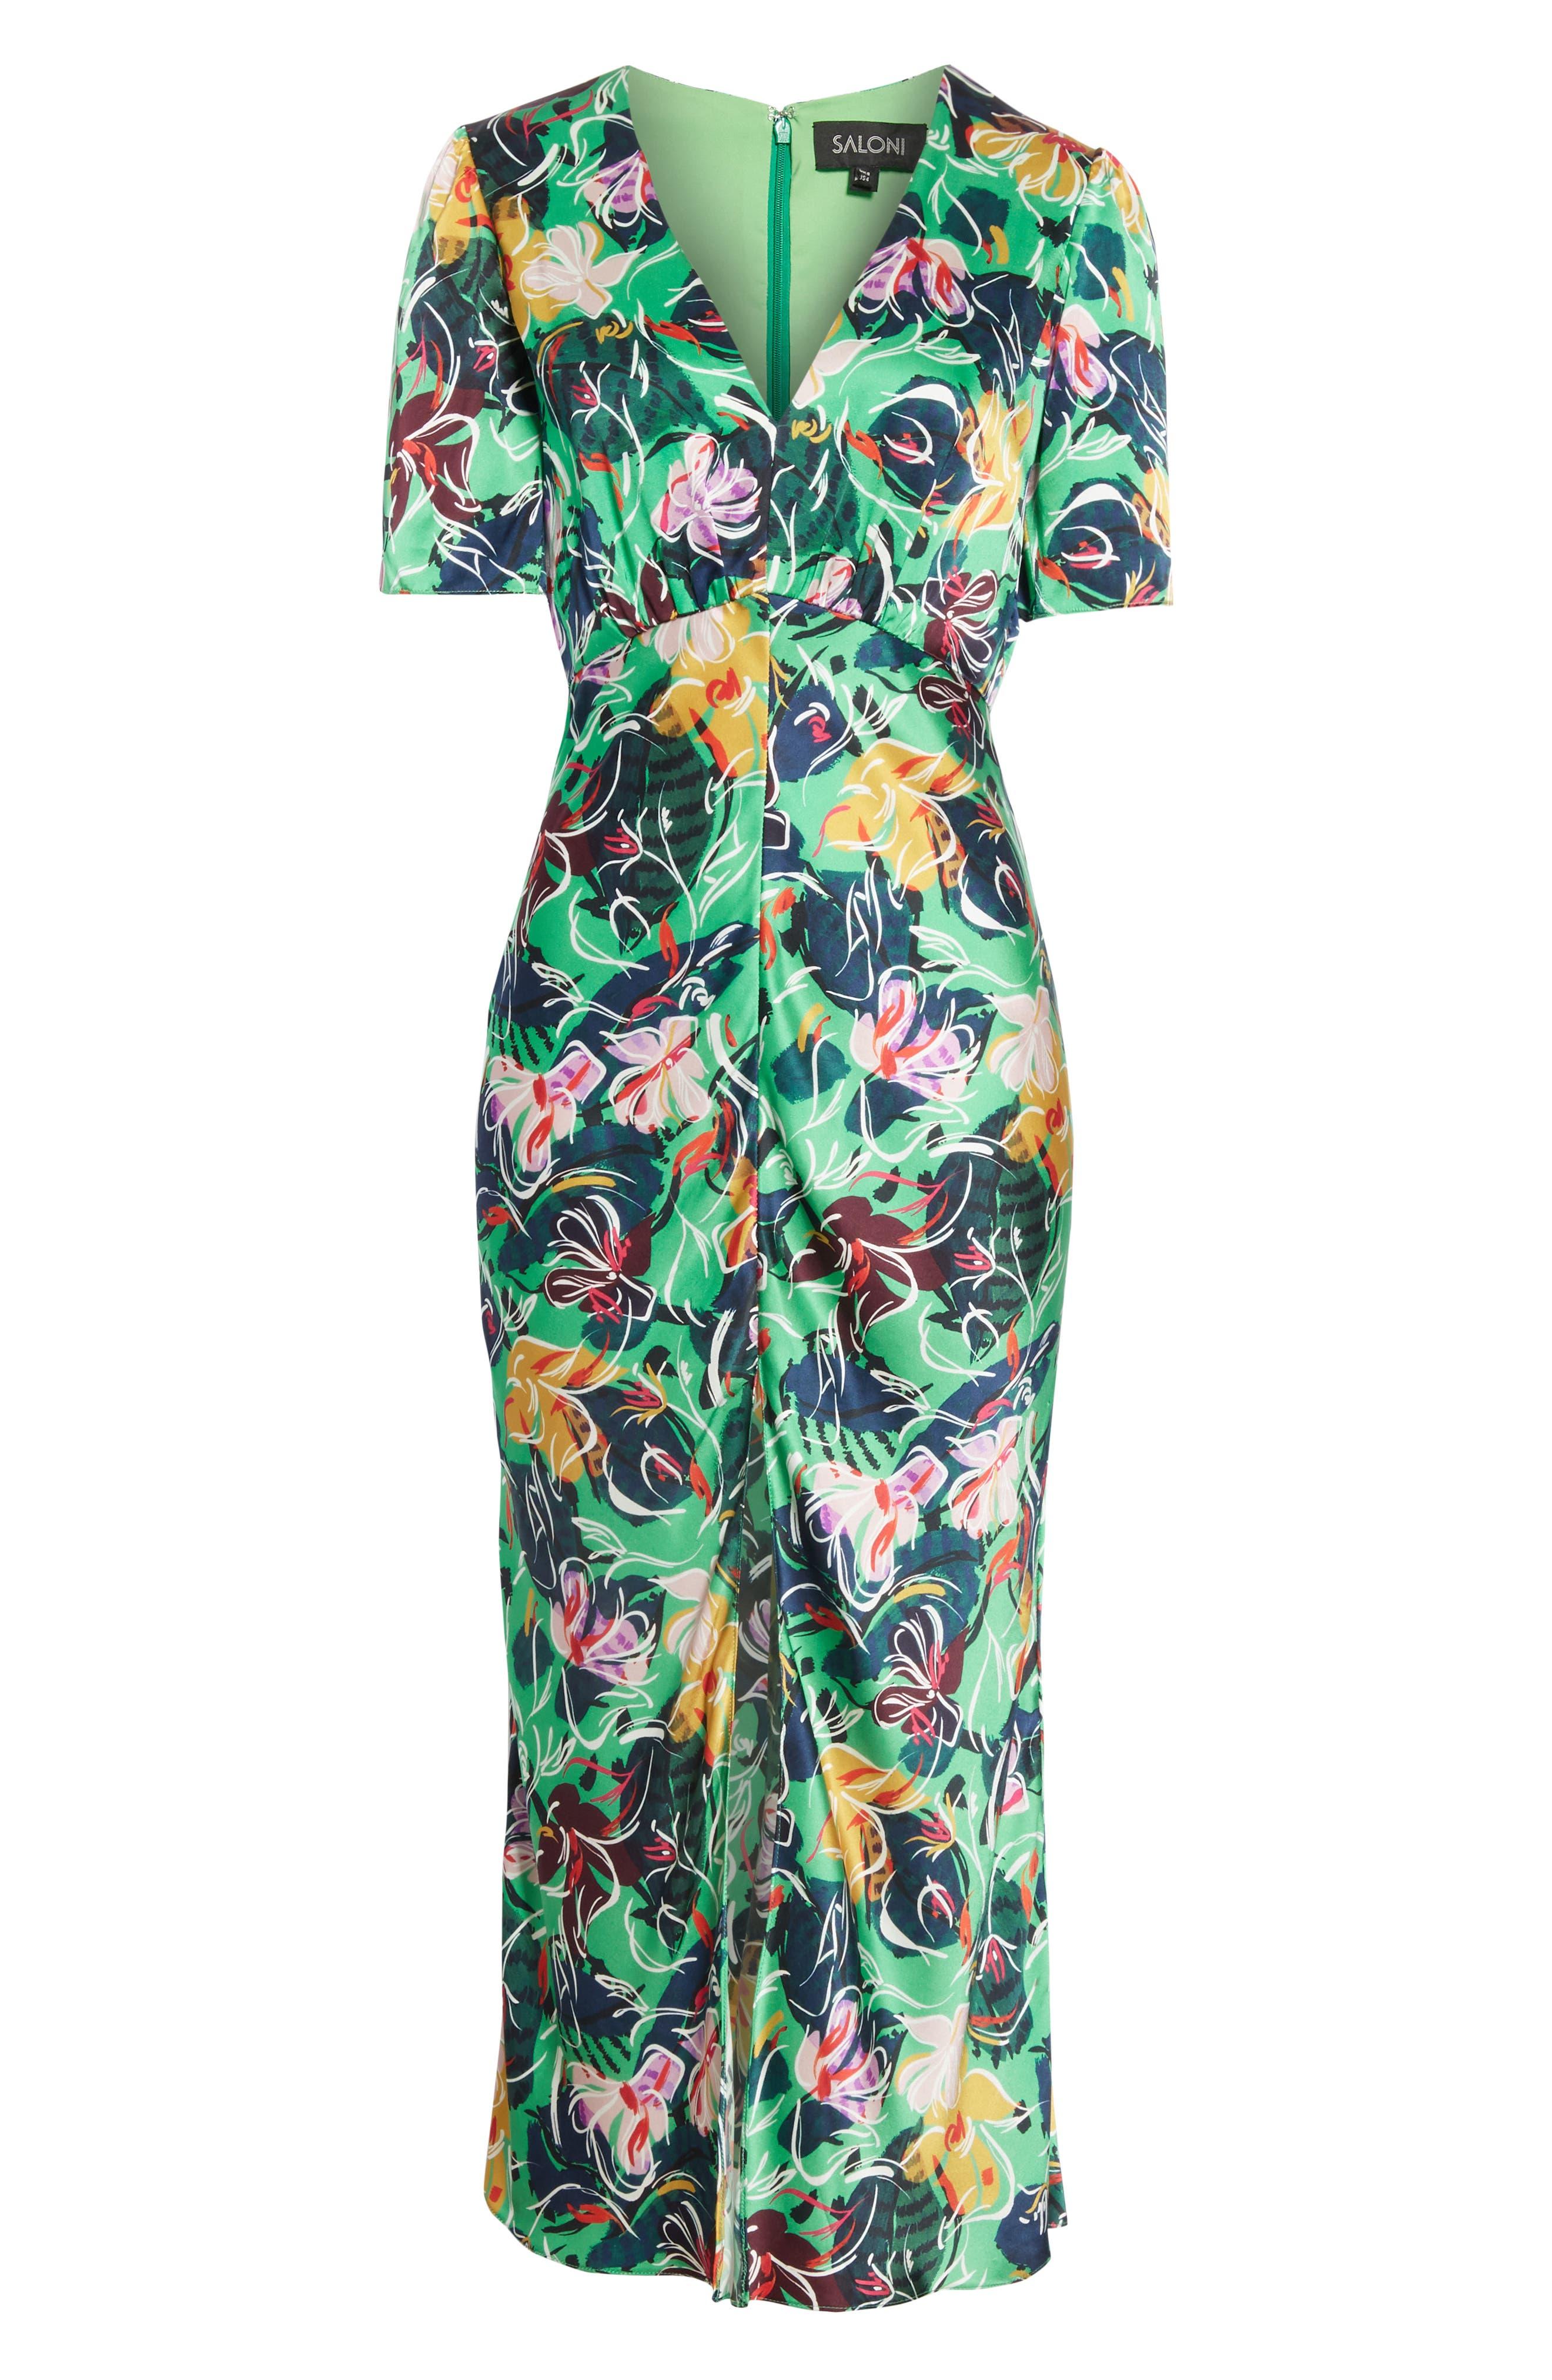 SALONI, Eden Floral Print Silk Midi Dress, Alternate thumbnail 6, color, EMERALD KINGCUP